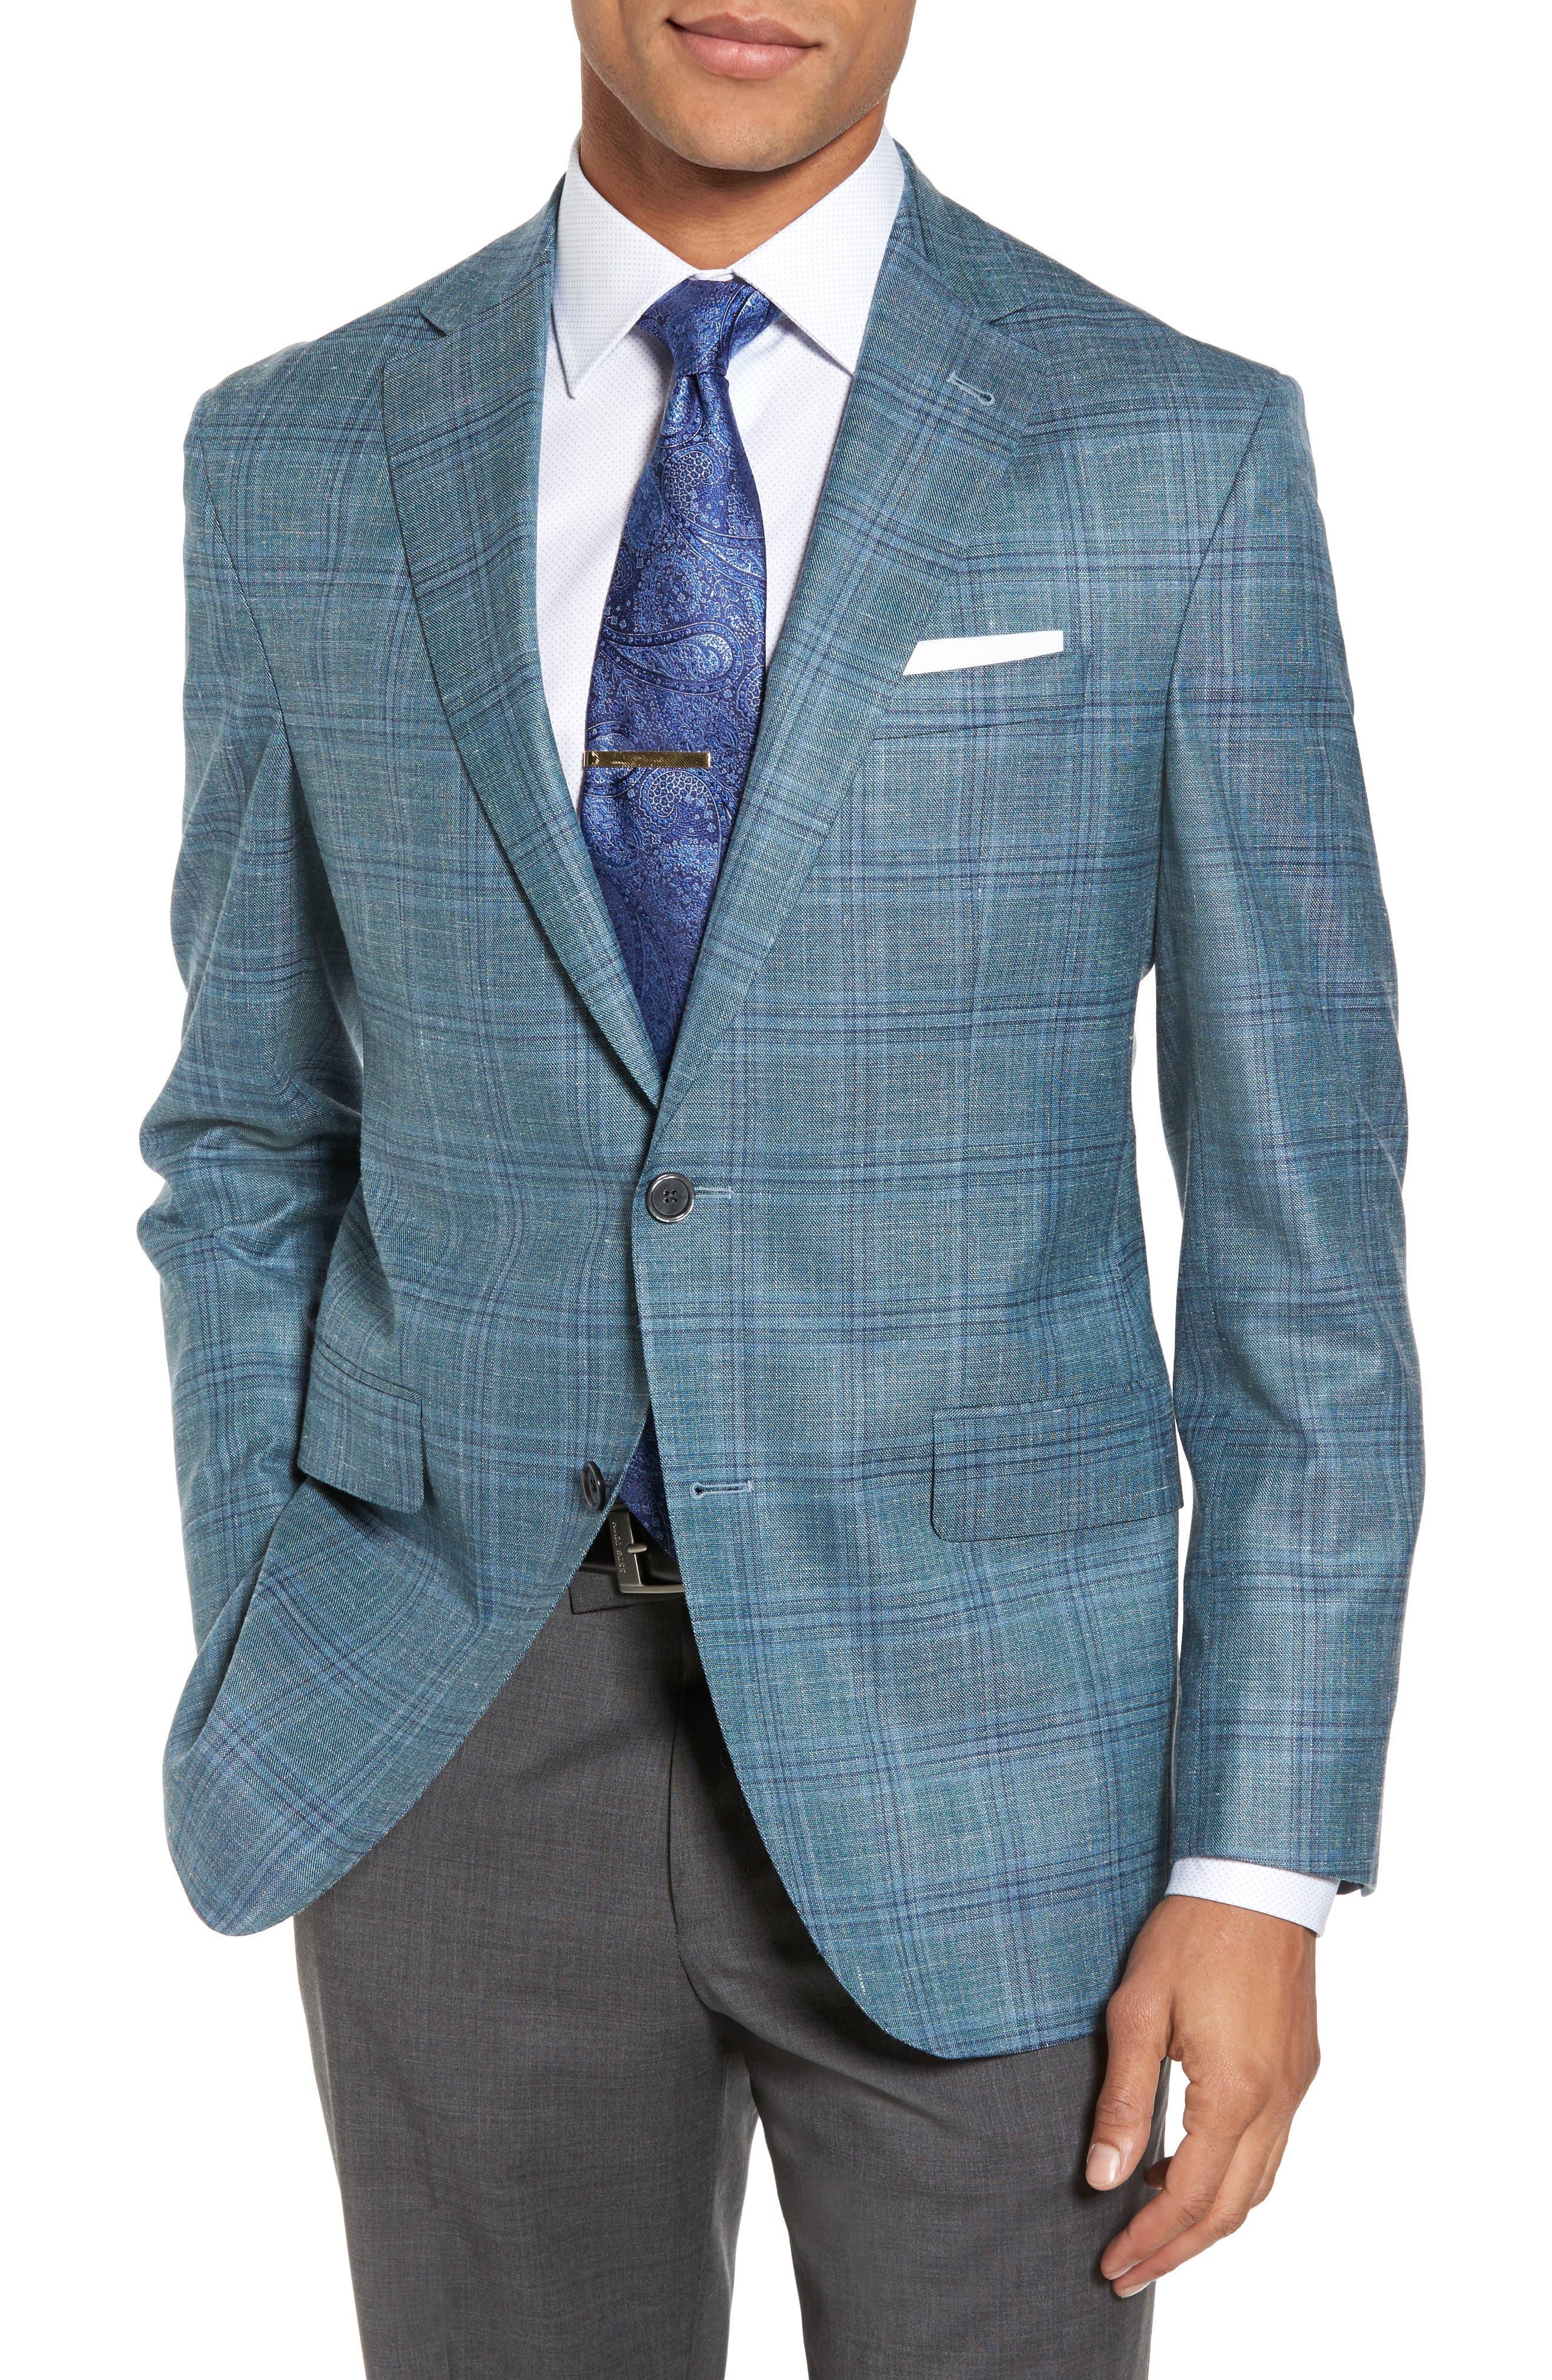 Main Image - David Donahue Ashton Classic Fit Stretch Plaid Wool Blend Sport Coat